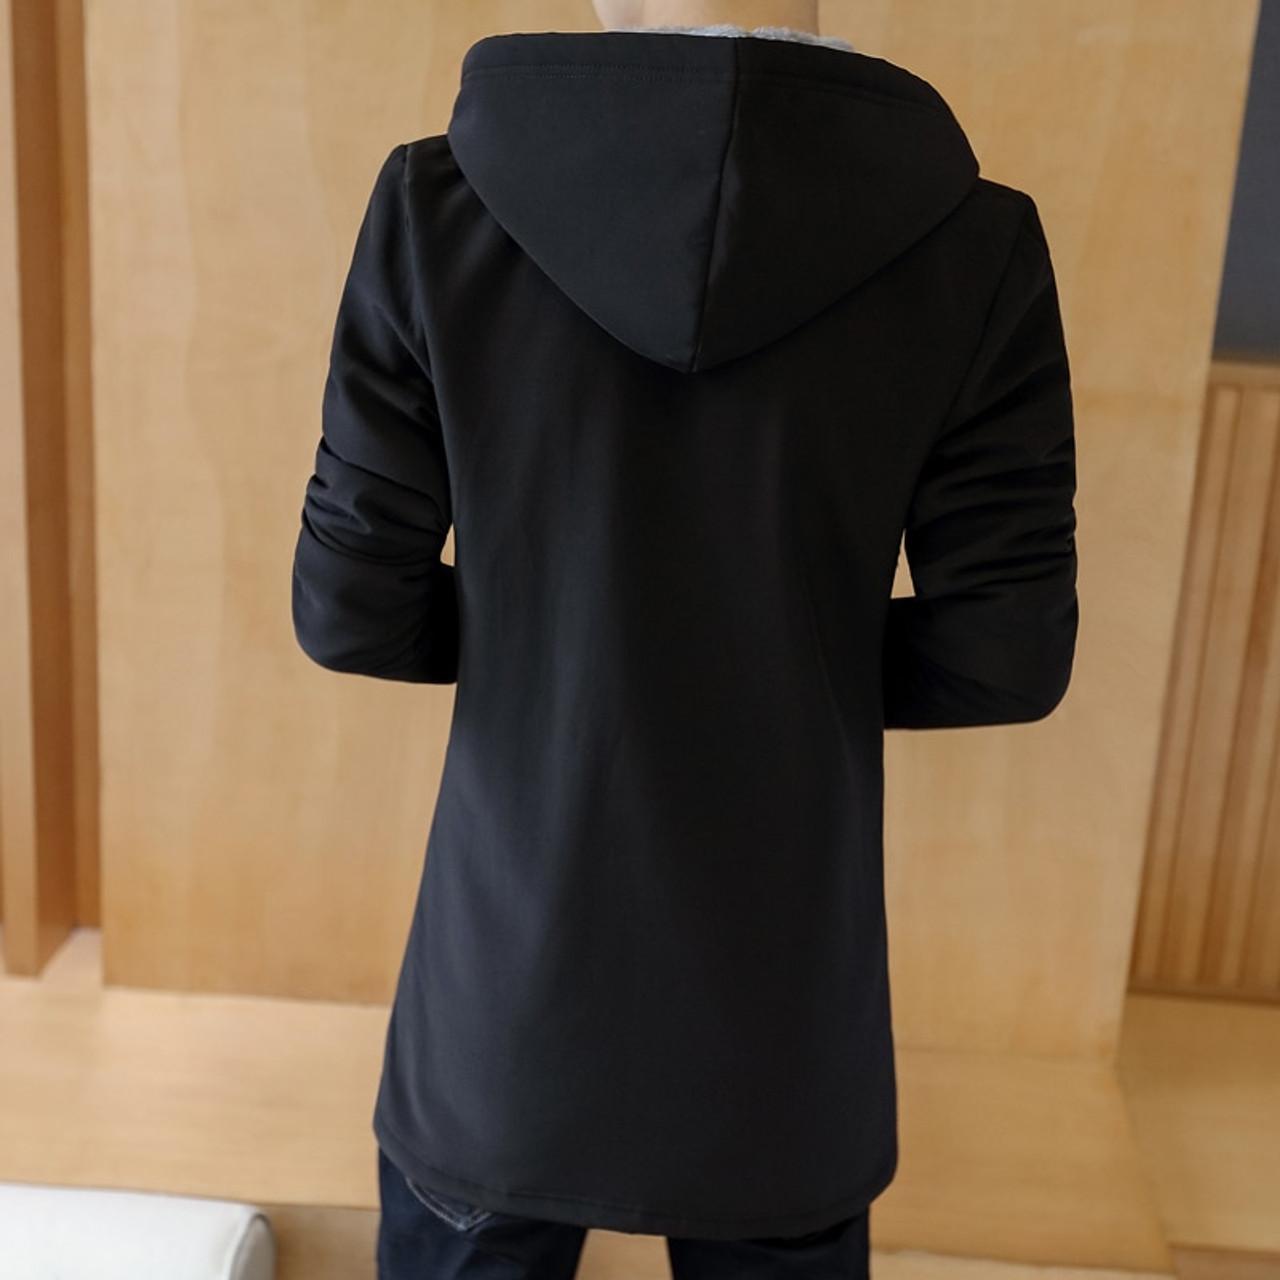 7f48c8978d7 ... 2018 Fashion Winter Men  s Cashmere Warm Jacket Hoodie Trench